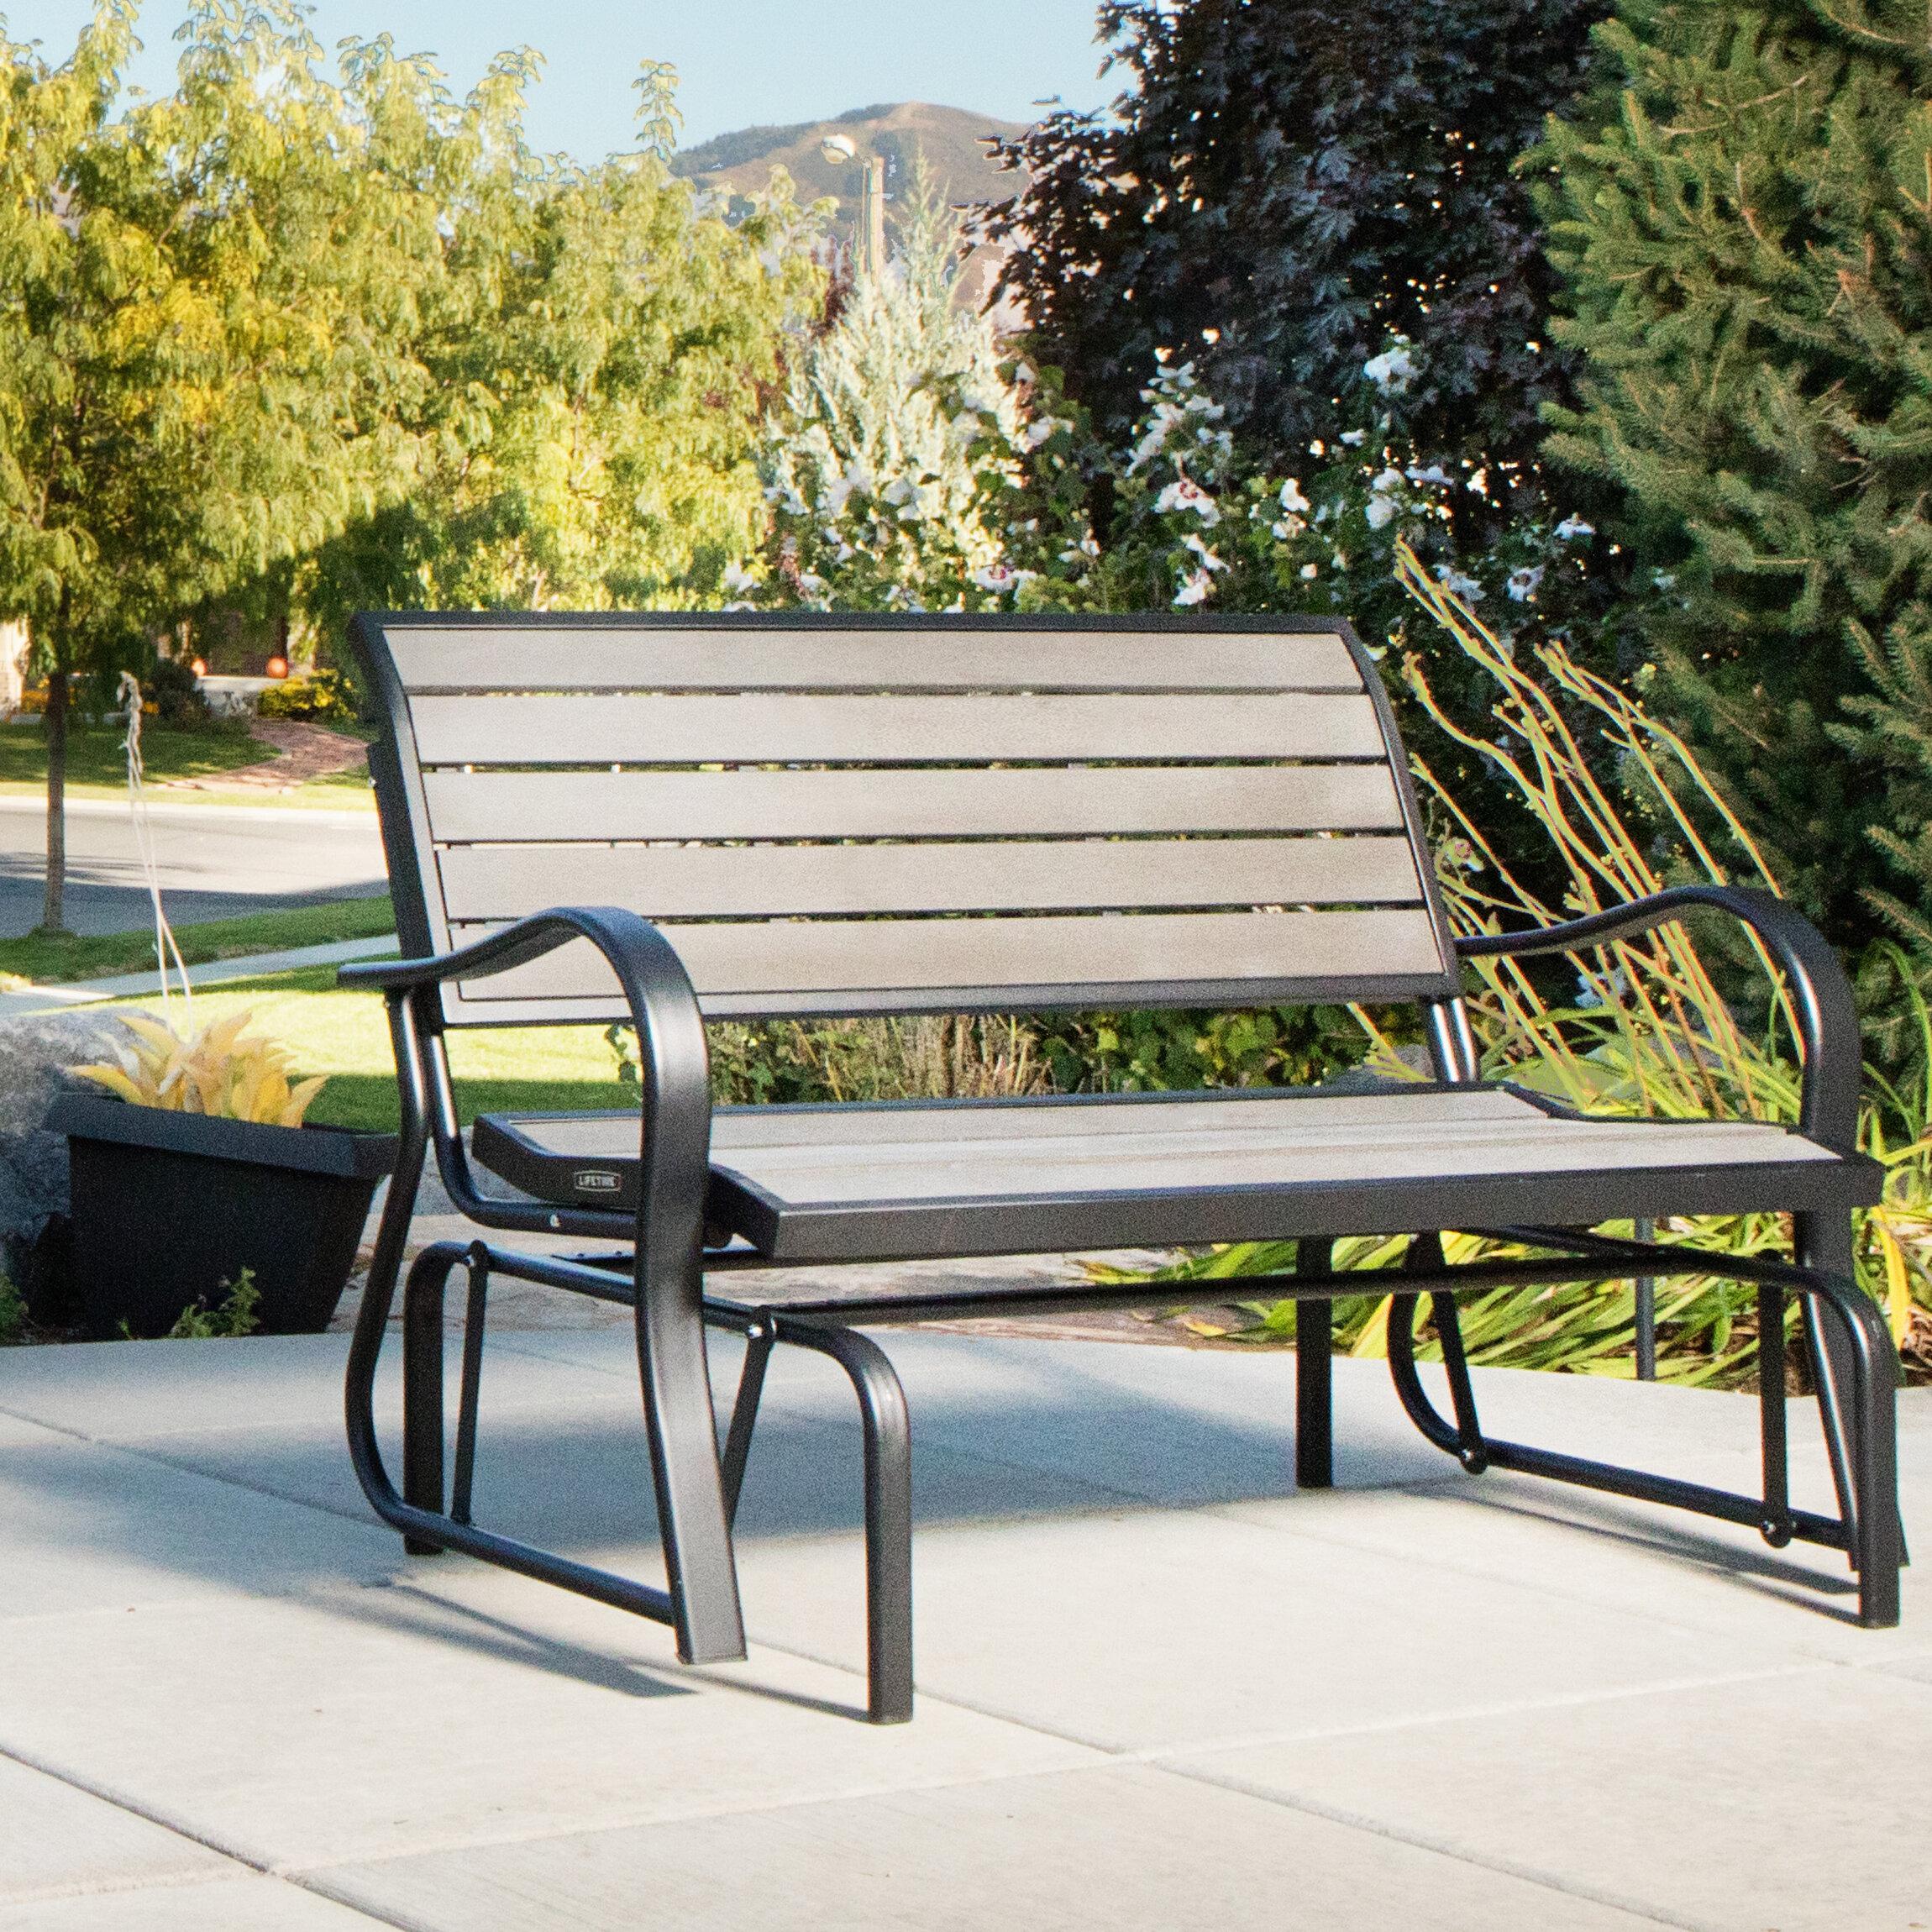 Wondrous Lifetime Steel Glider Bench Reviews Wayfair Machost Co Dining Chair Design Ideas Machostcouk